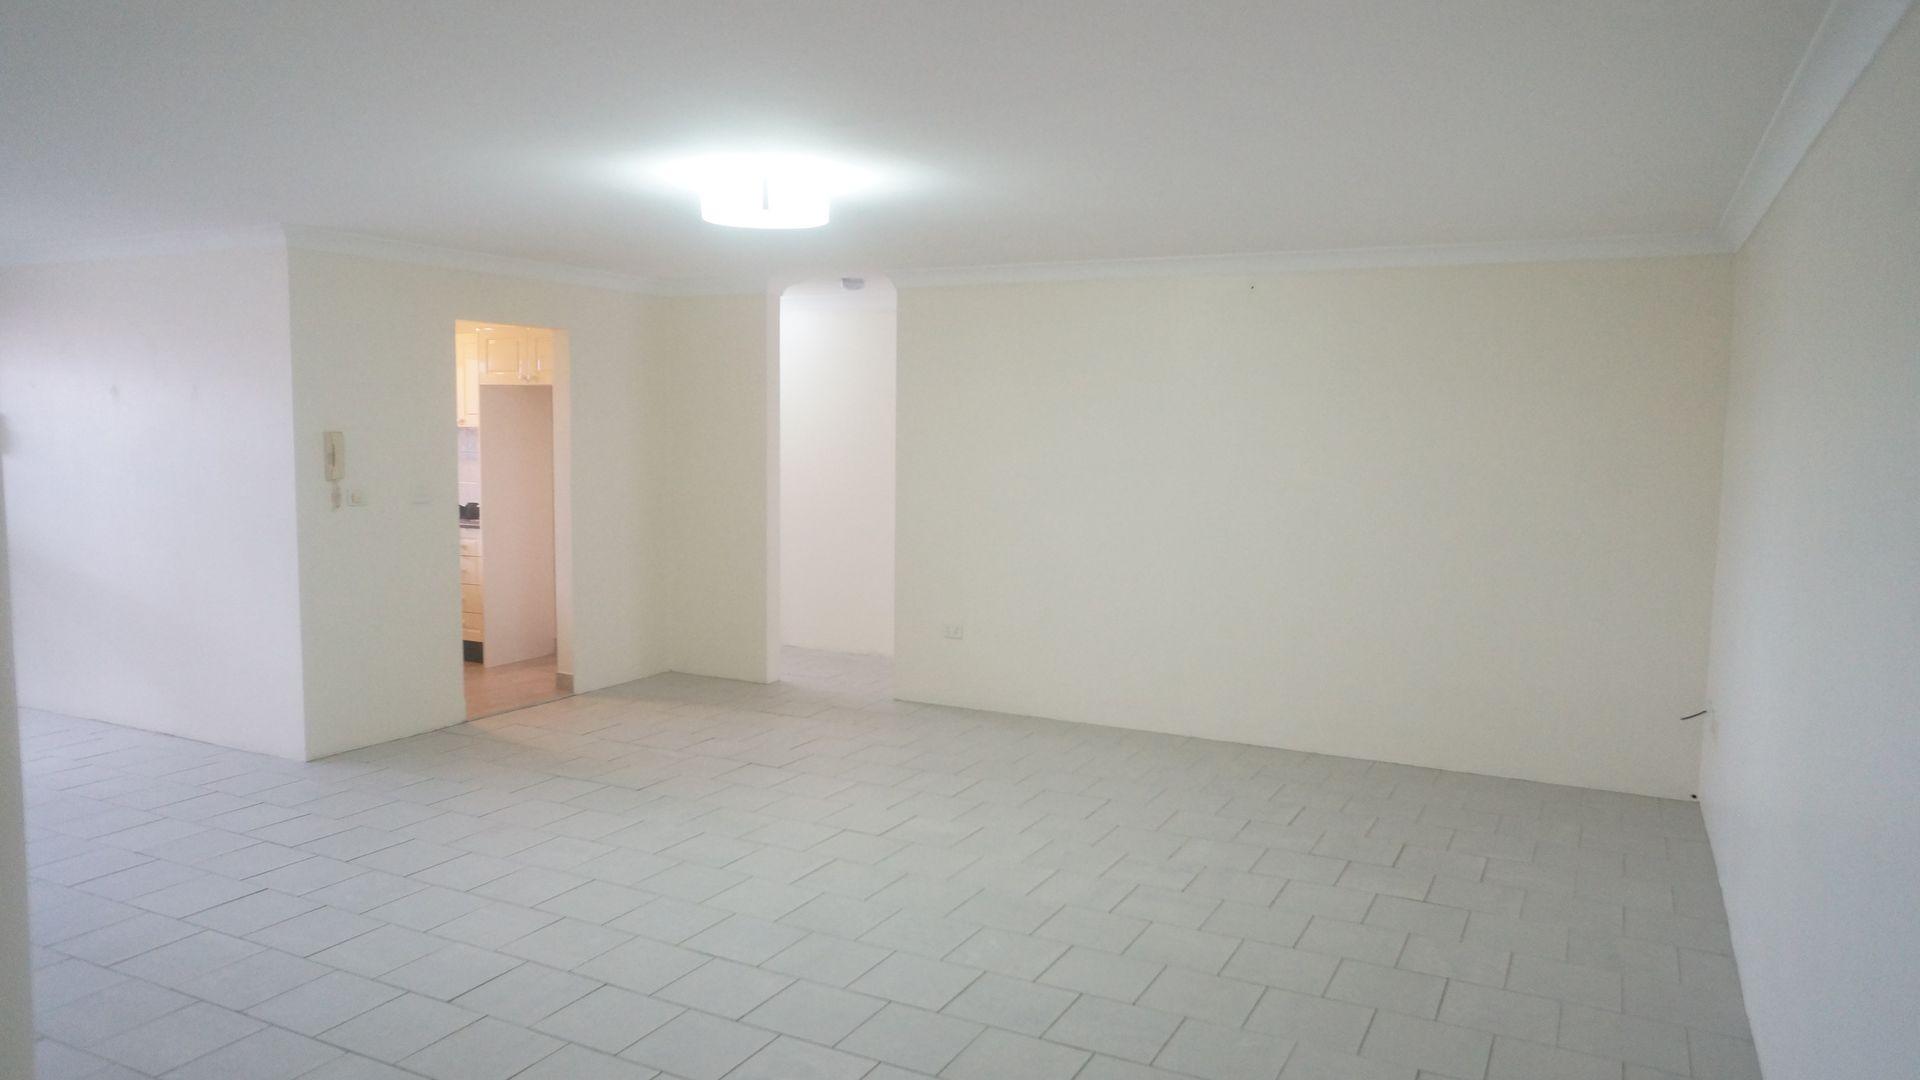 43 Northam Avenue, Bankstown NSW 2200, Image 1